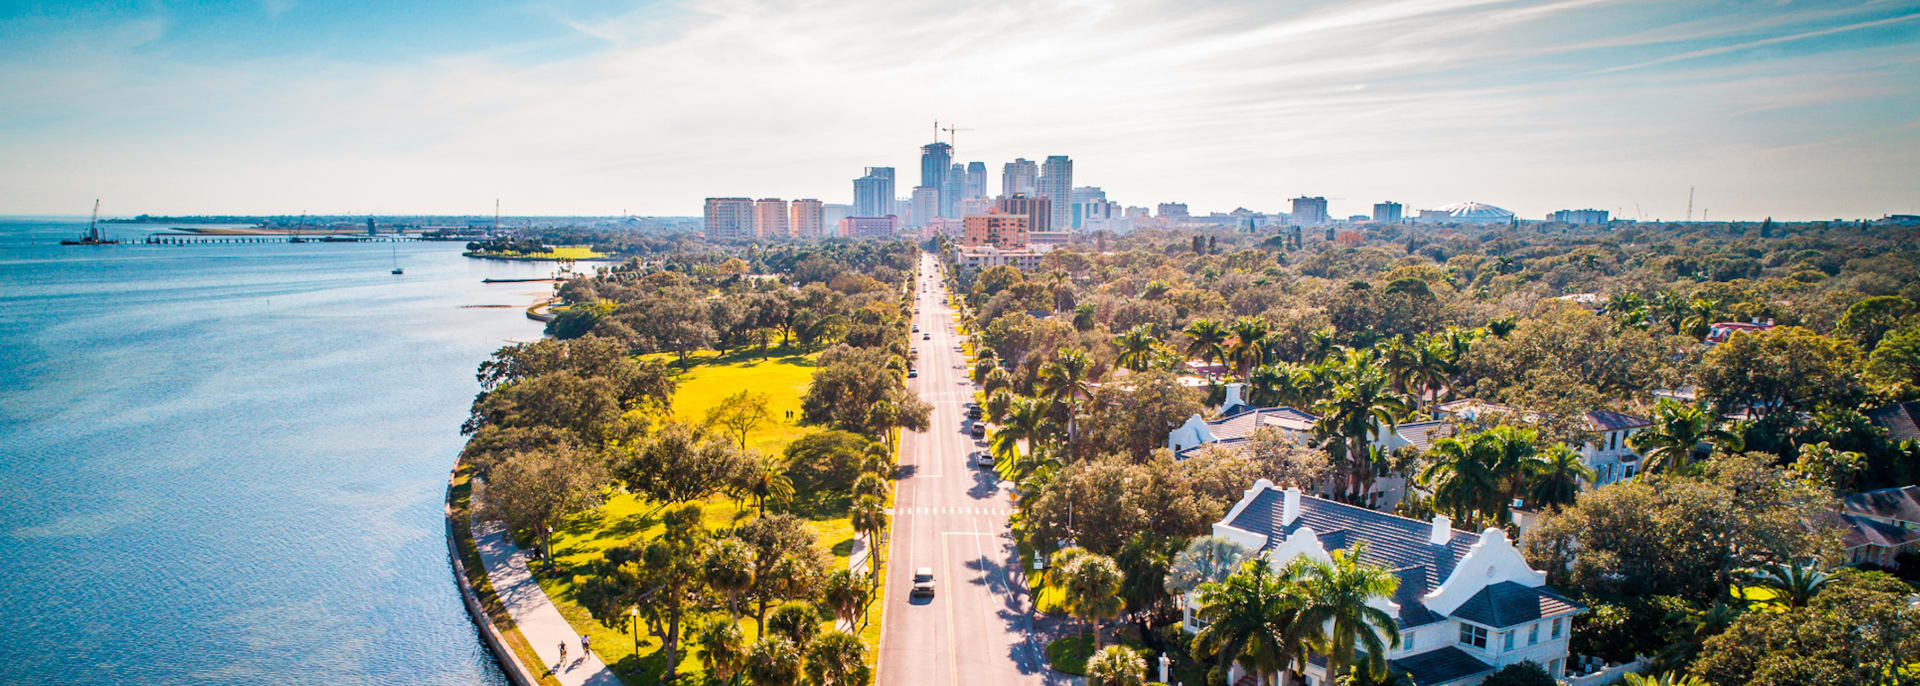 St. Pete, Florida, USA